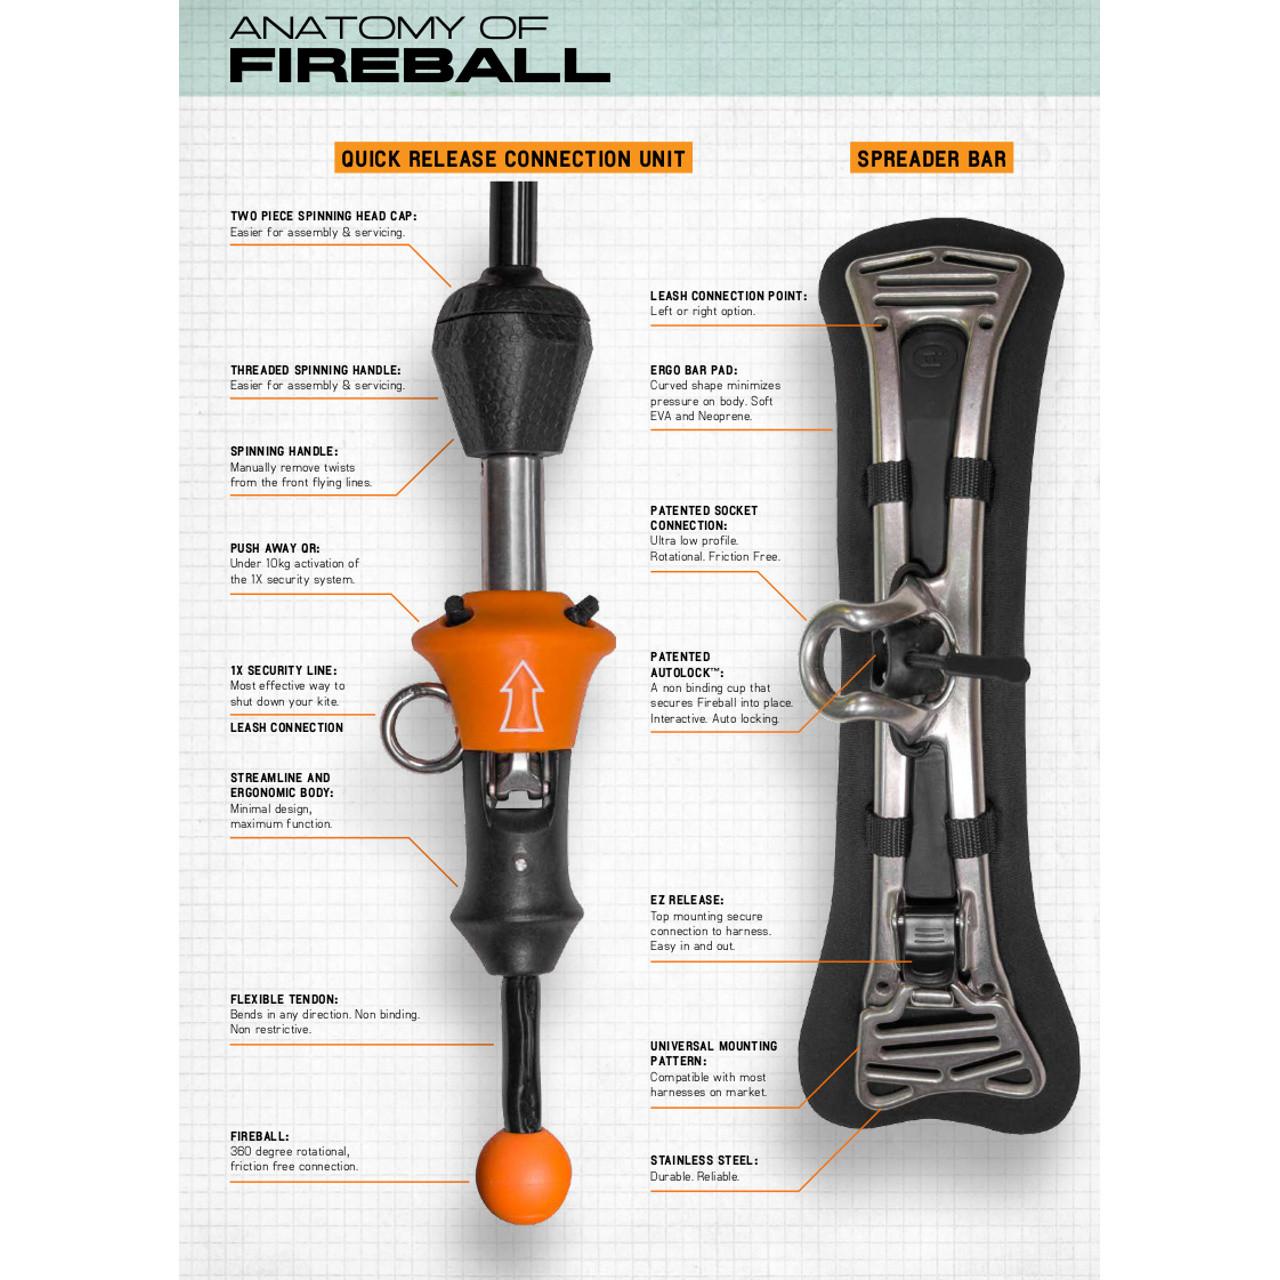 Cabrinha Fireball Anatomy